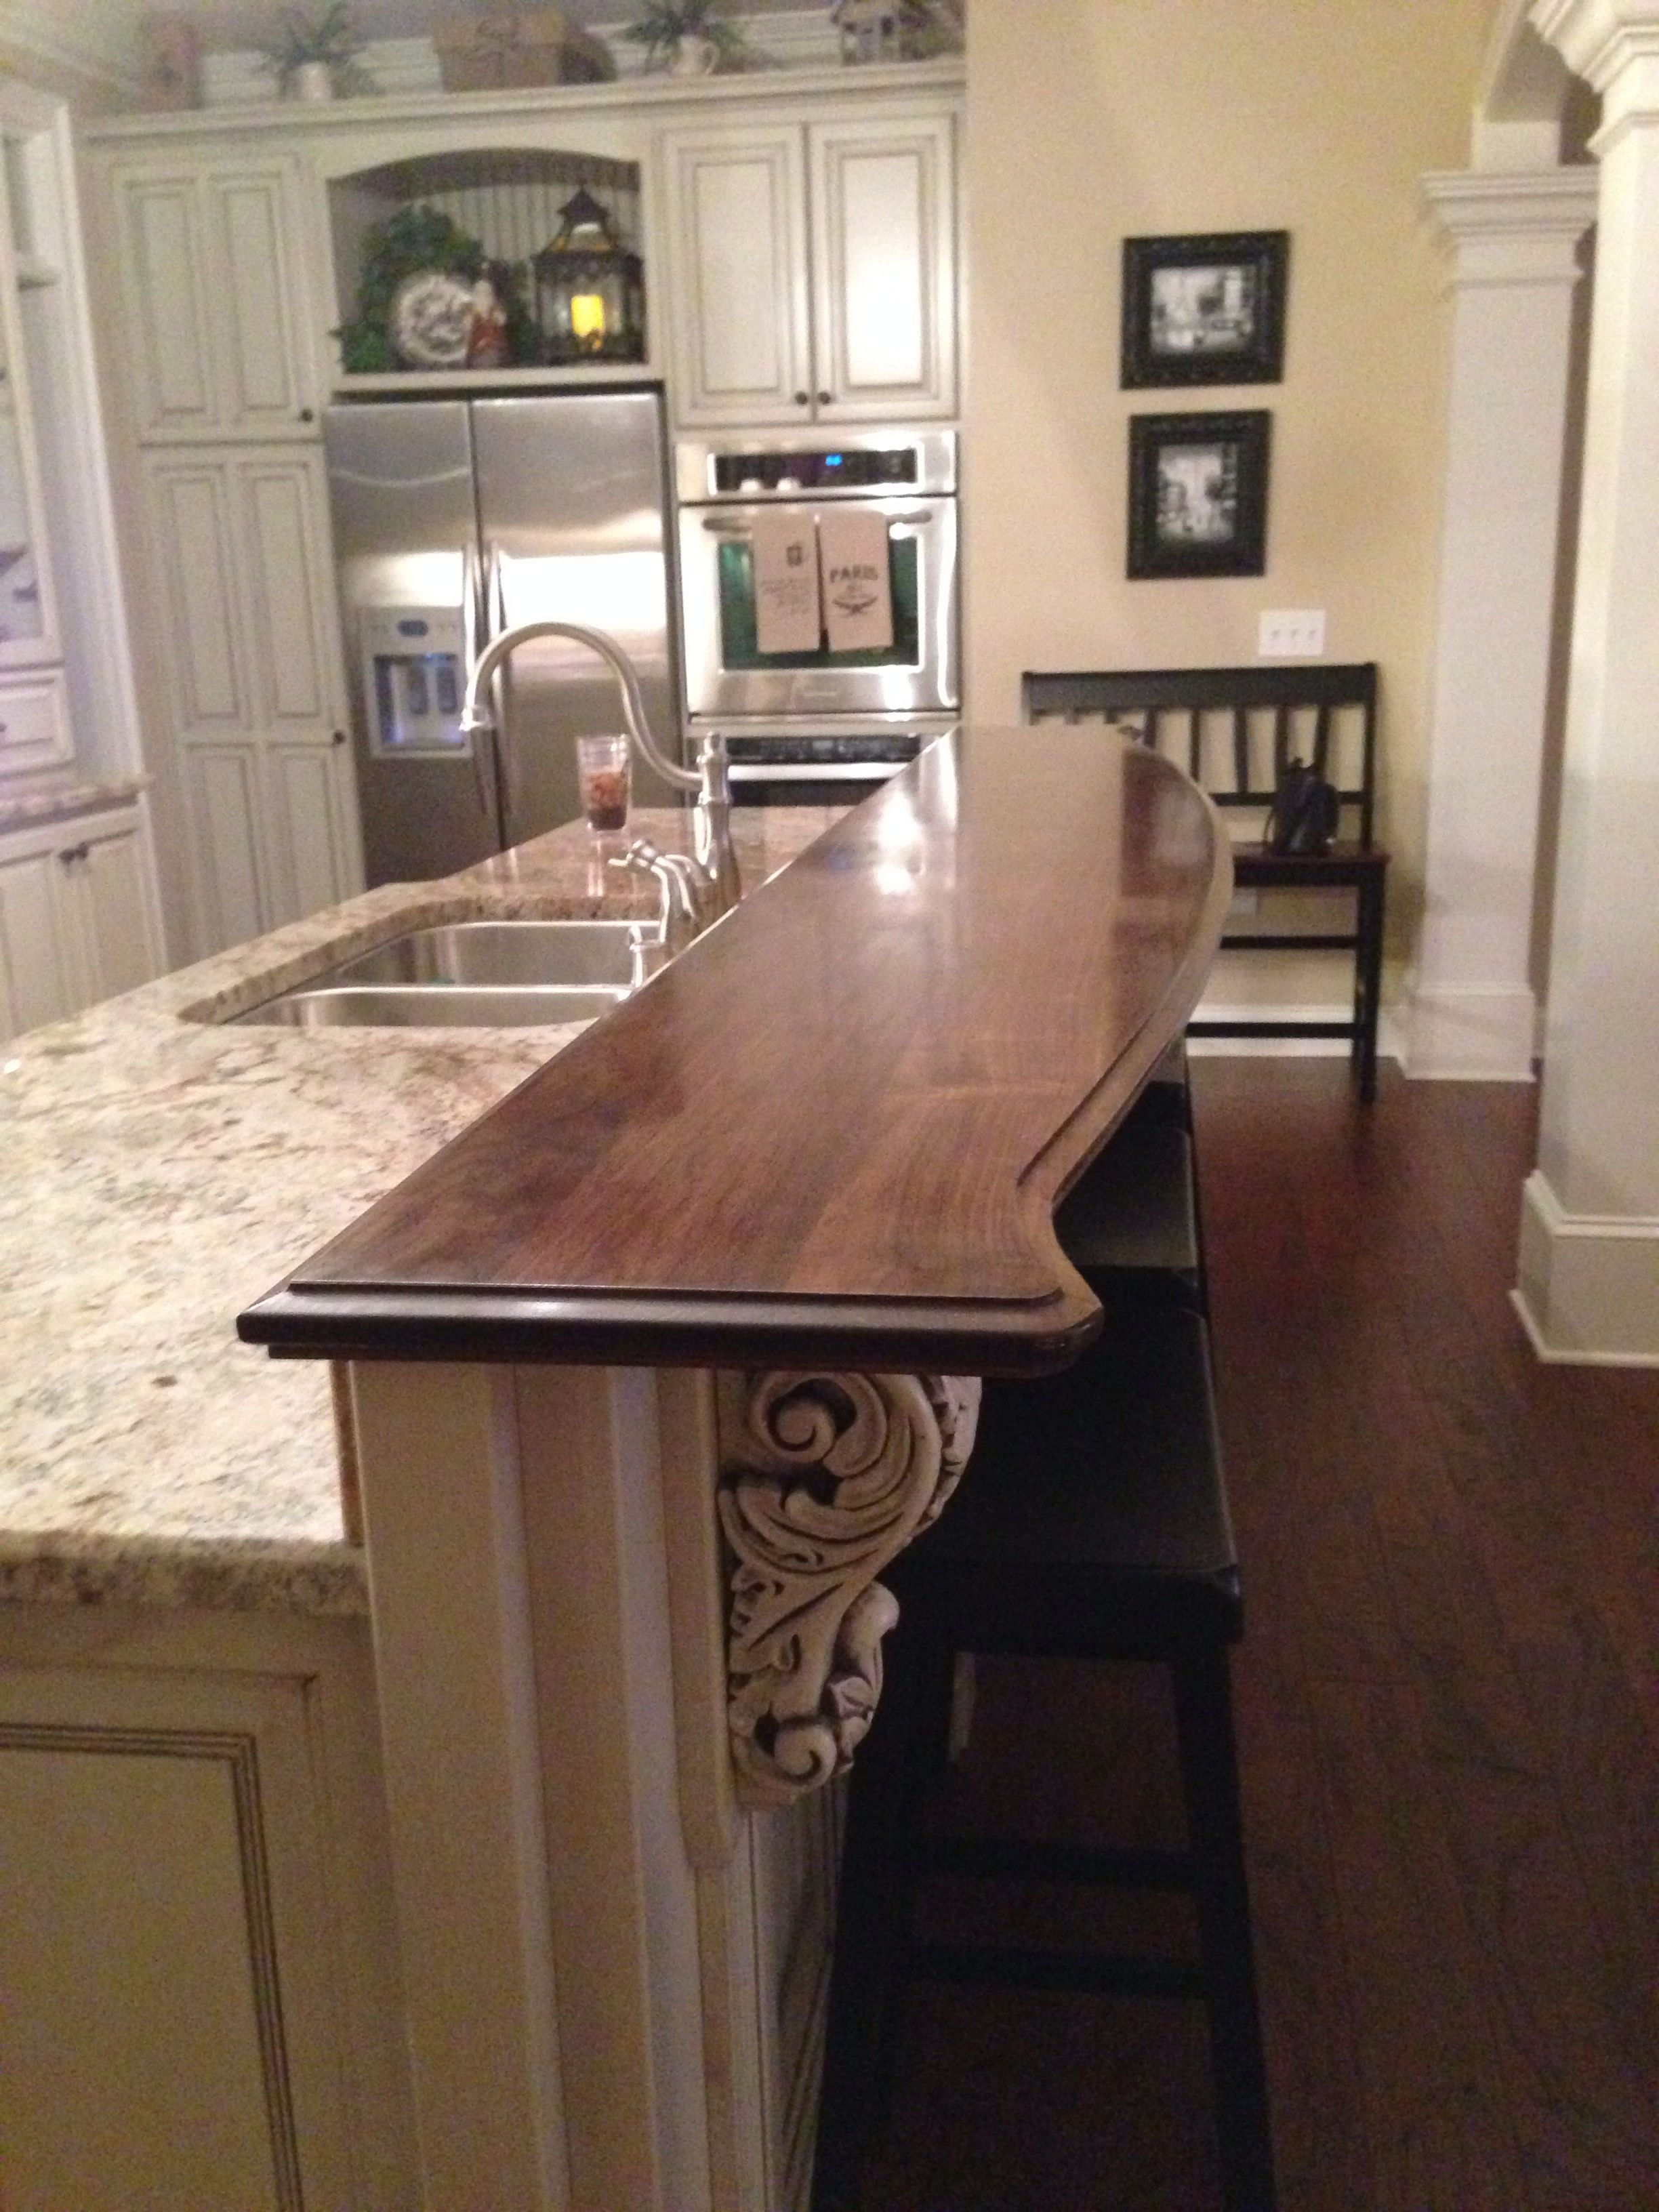 black walnut countertop walnut countertop kitchen kitchen dining on kitchen decor black countertop id=15534